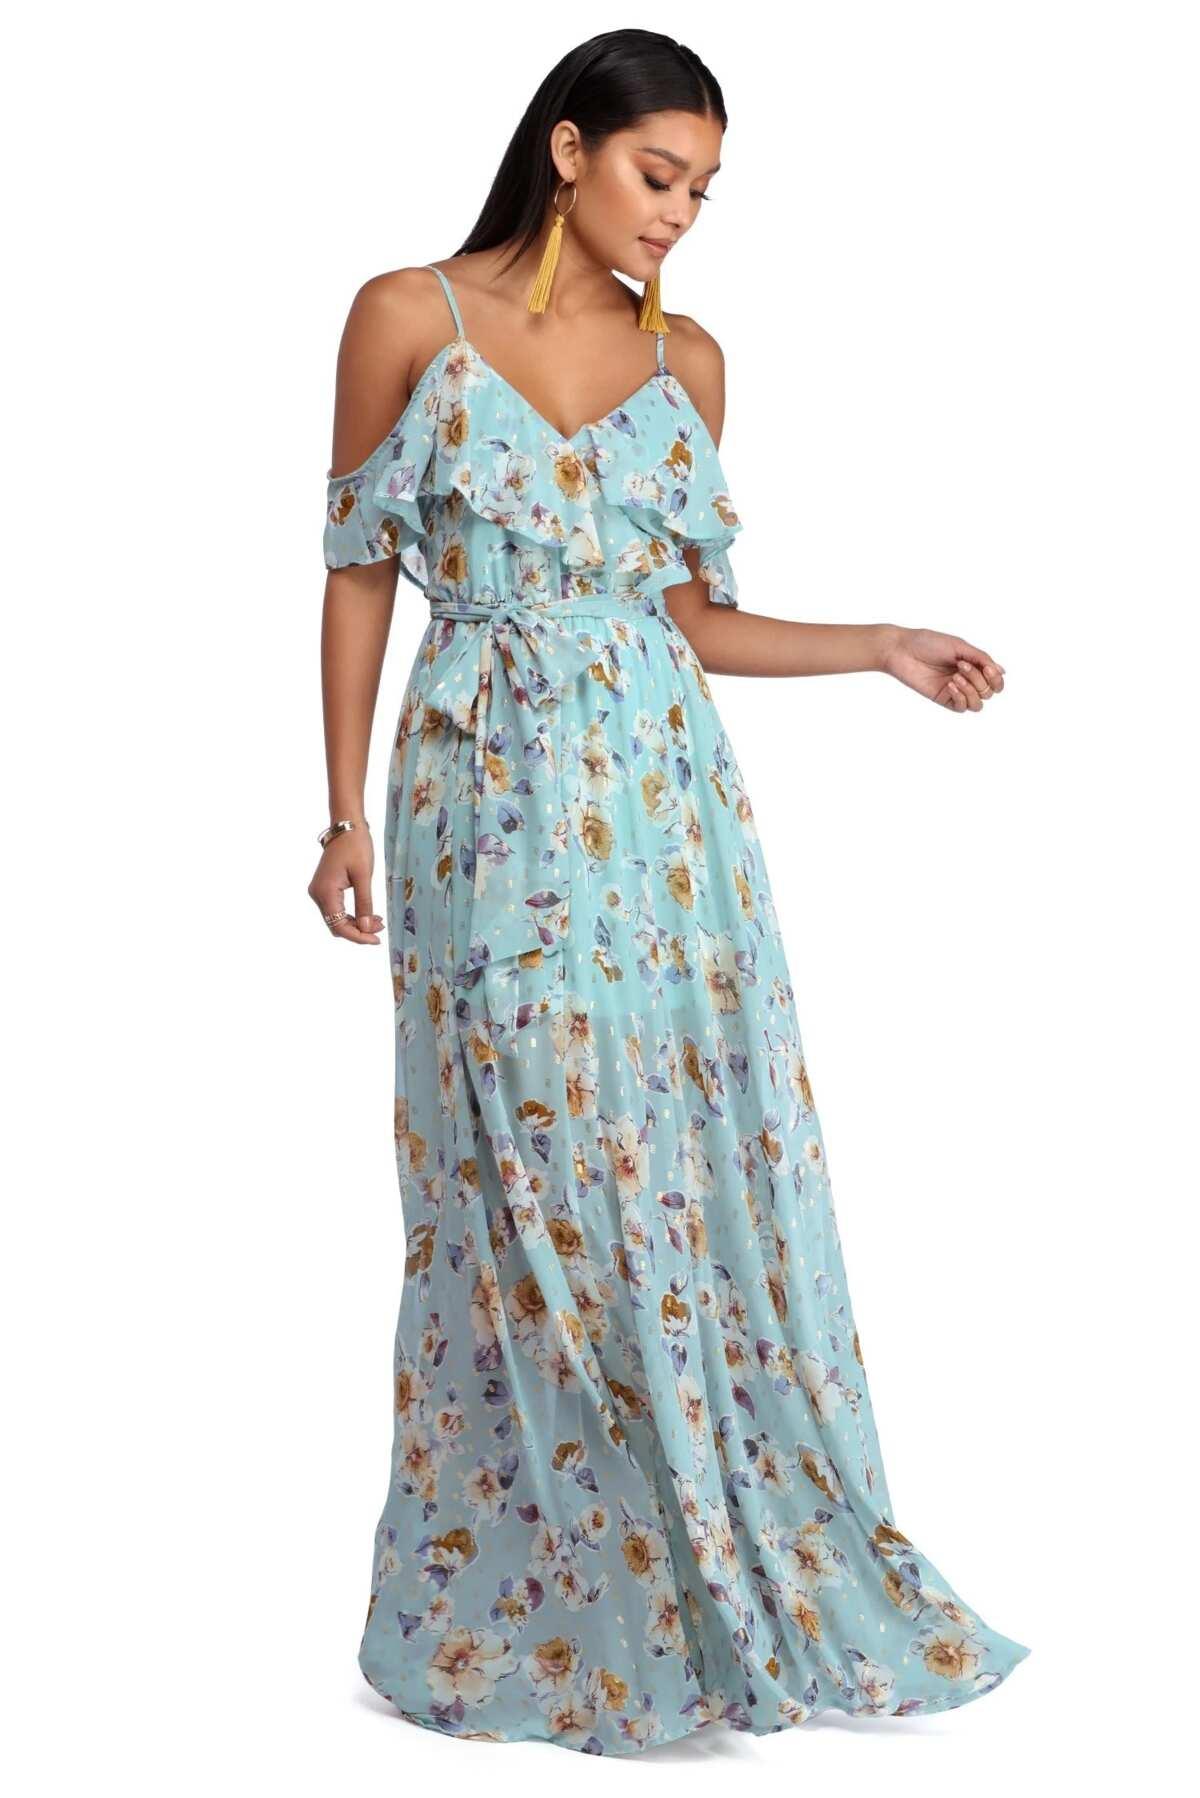 Long chiffon sundress with floral pattern